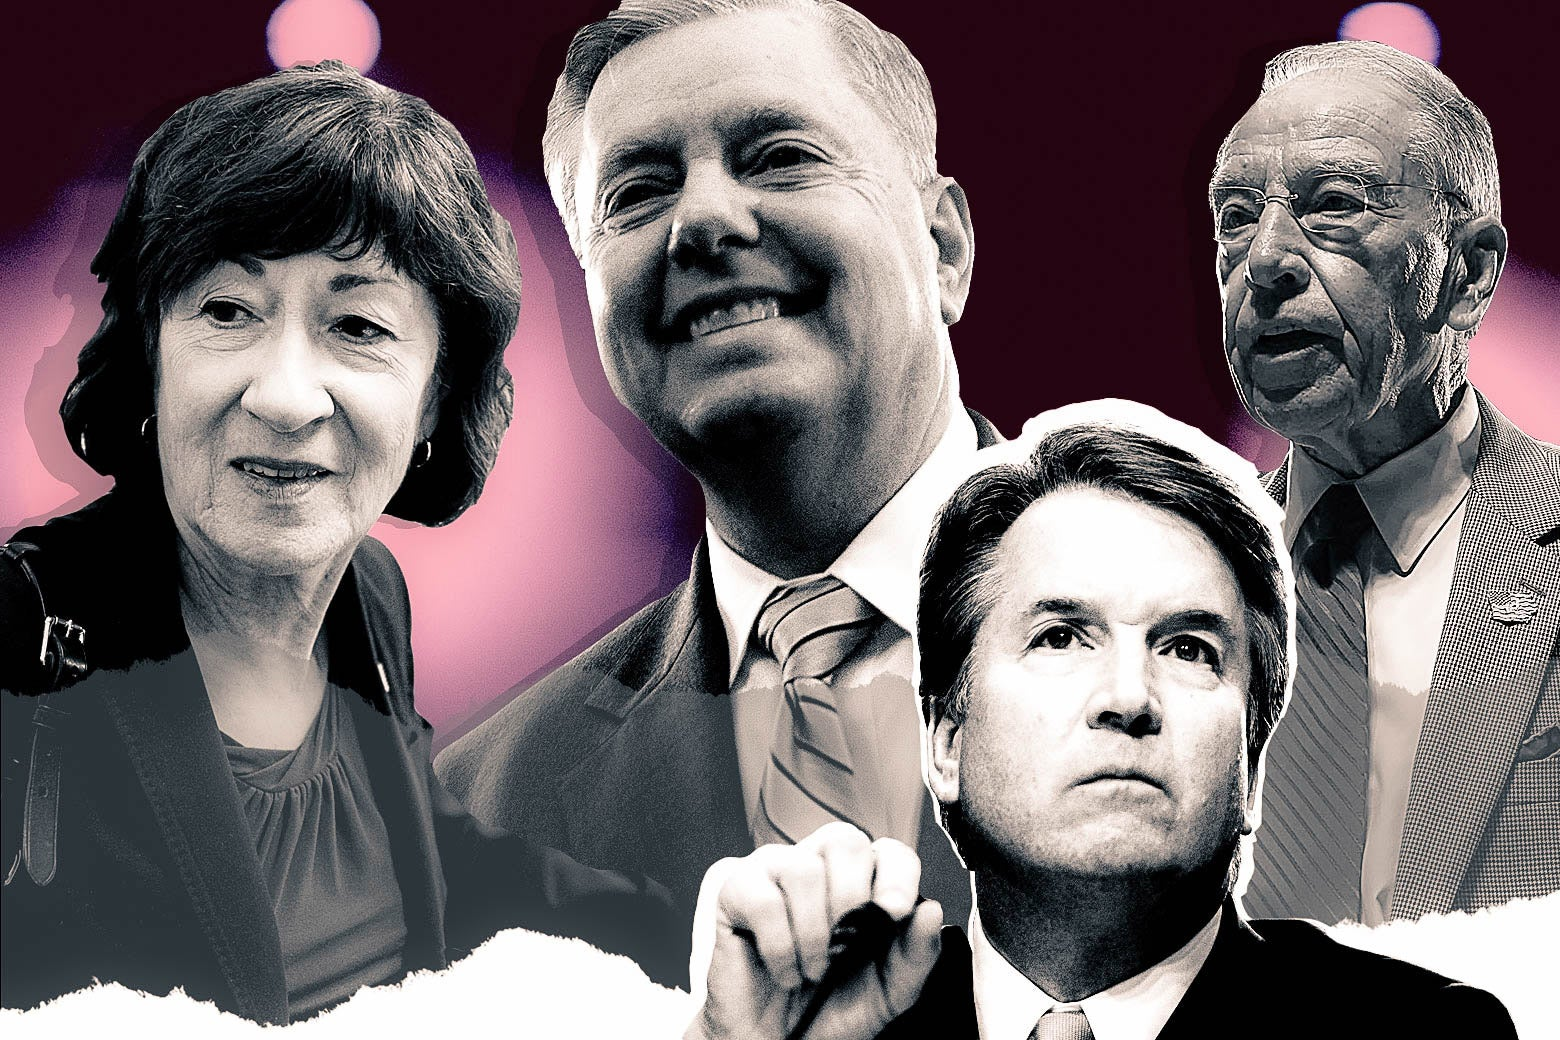 Photo collage of Sen. Susan Collins, Sen. Lindsey Graham, Judge Brett Kavanaugh, and Sen. Chuck Grassley